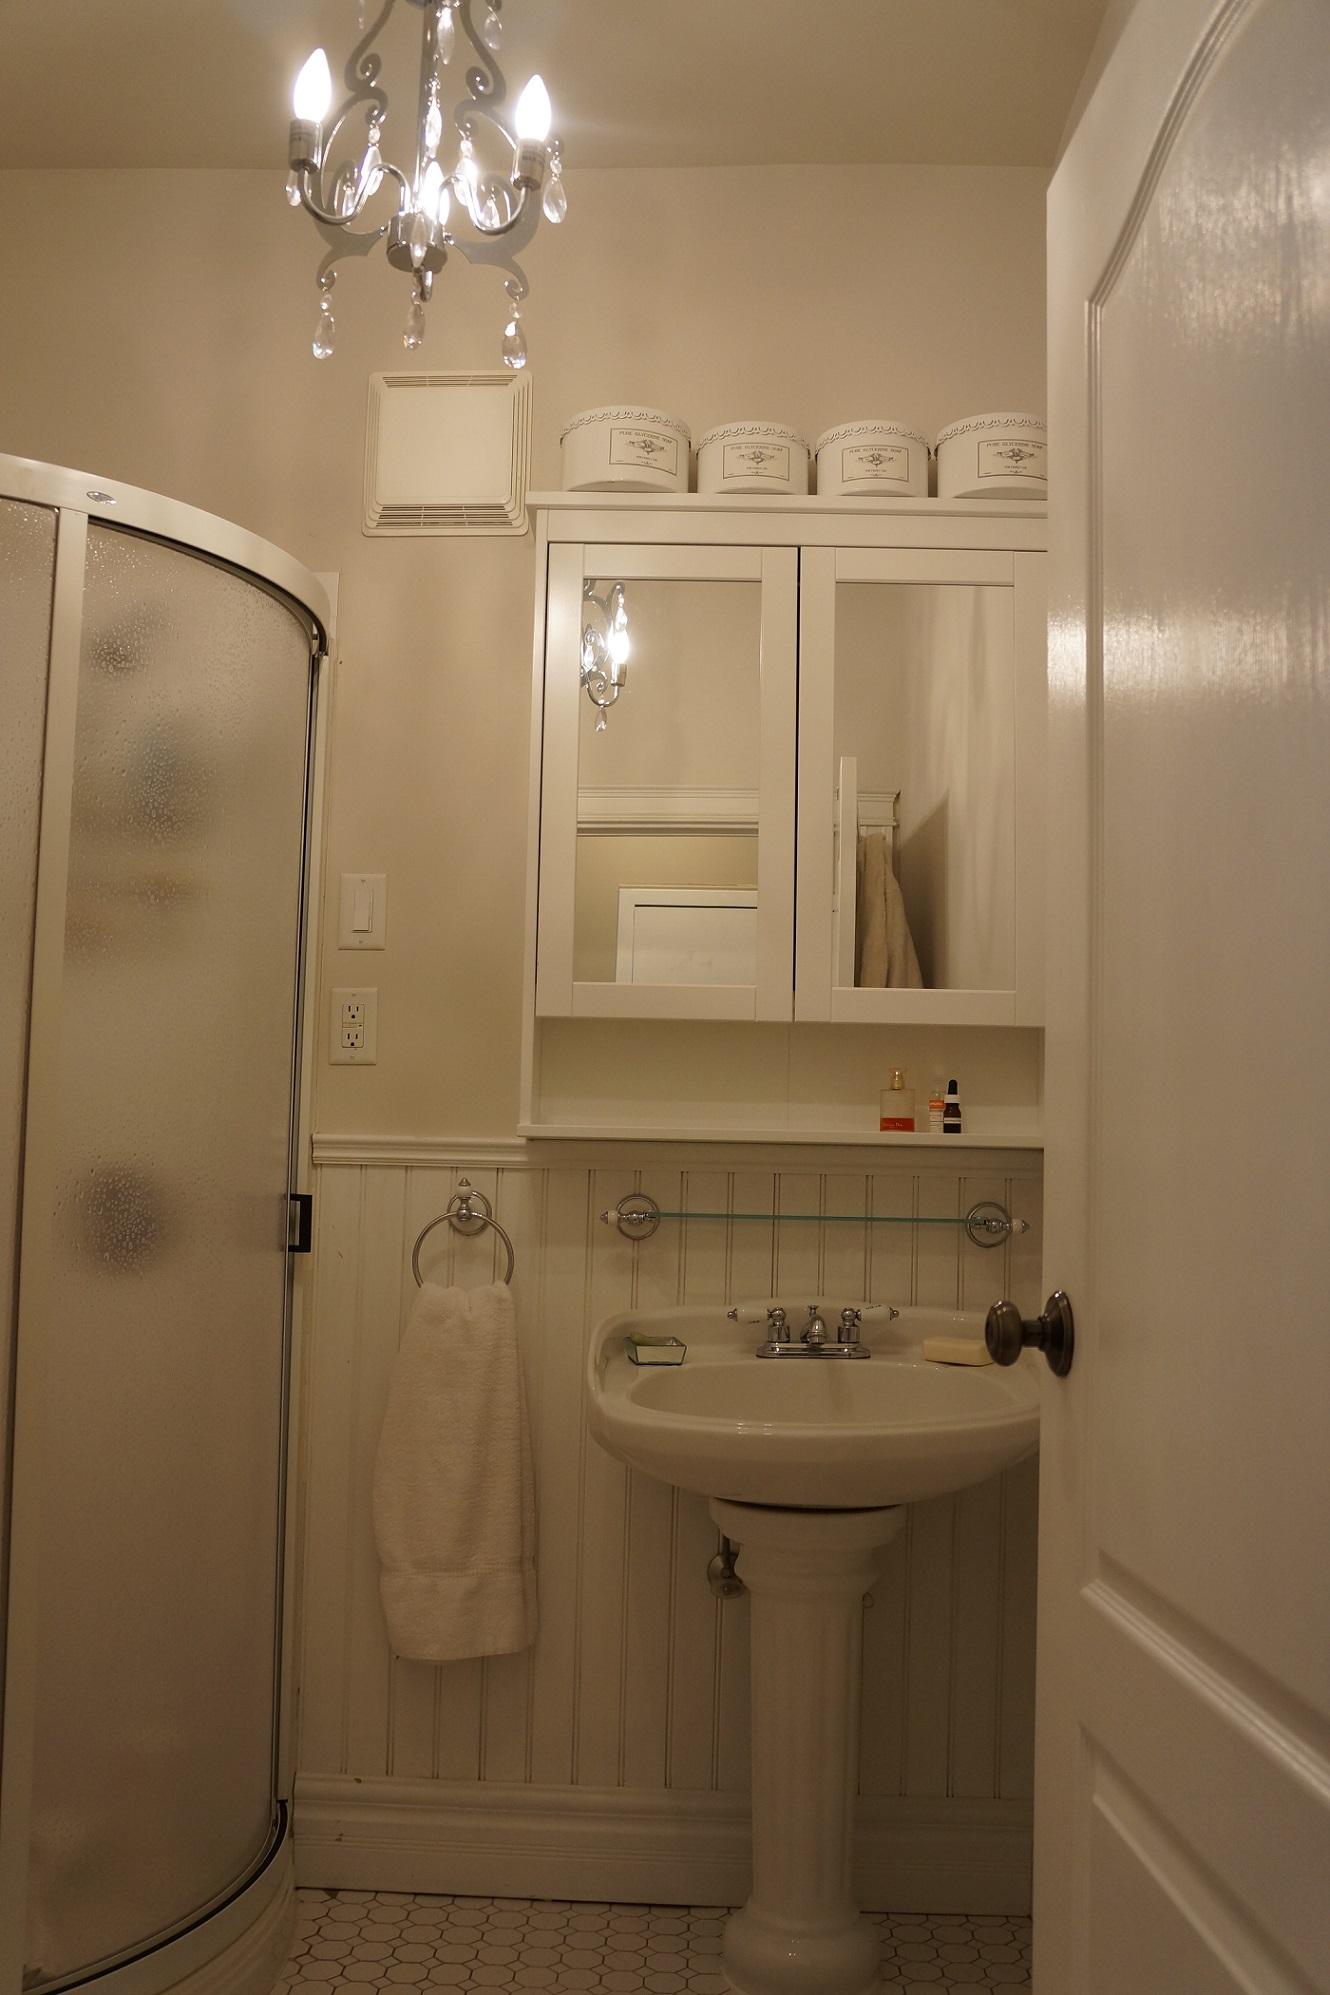 154 Lower Scott St.,Winnipeg,Manitoba,1 Bedroom Bedrooms,1 BathroomBathrooms,Triplex,Scott St.,1136